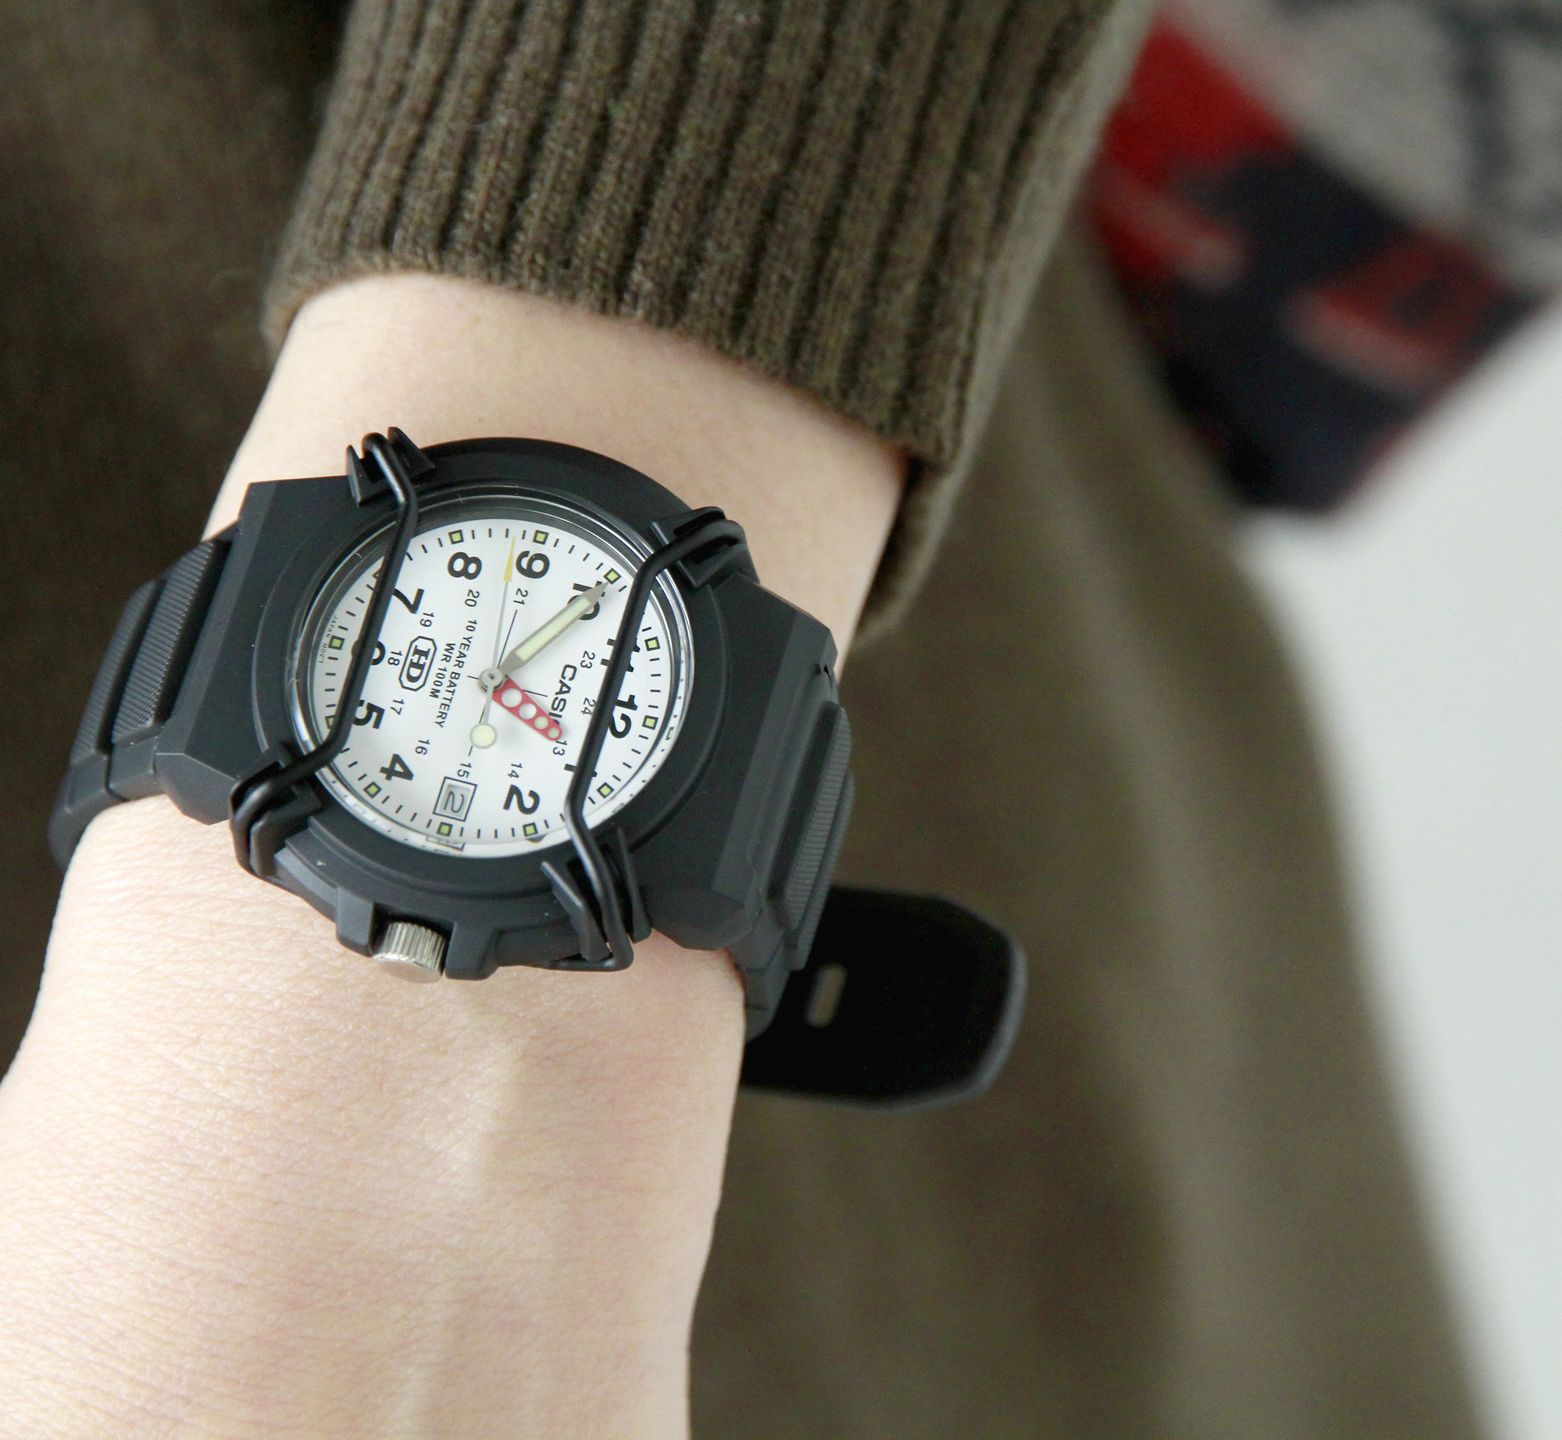 66d22d1bfd99d2 CASIO│アナログウォッチ hda-600b-sn | 好き | ウォッチ、アナログ、腕時計